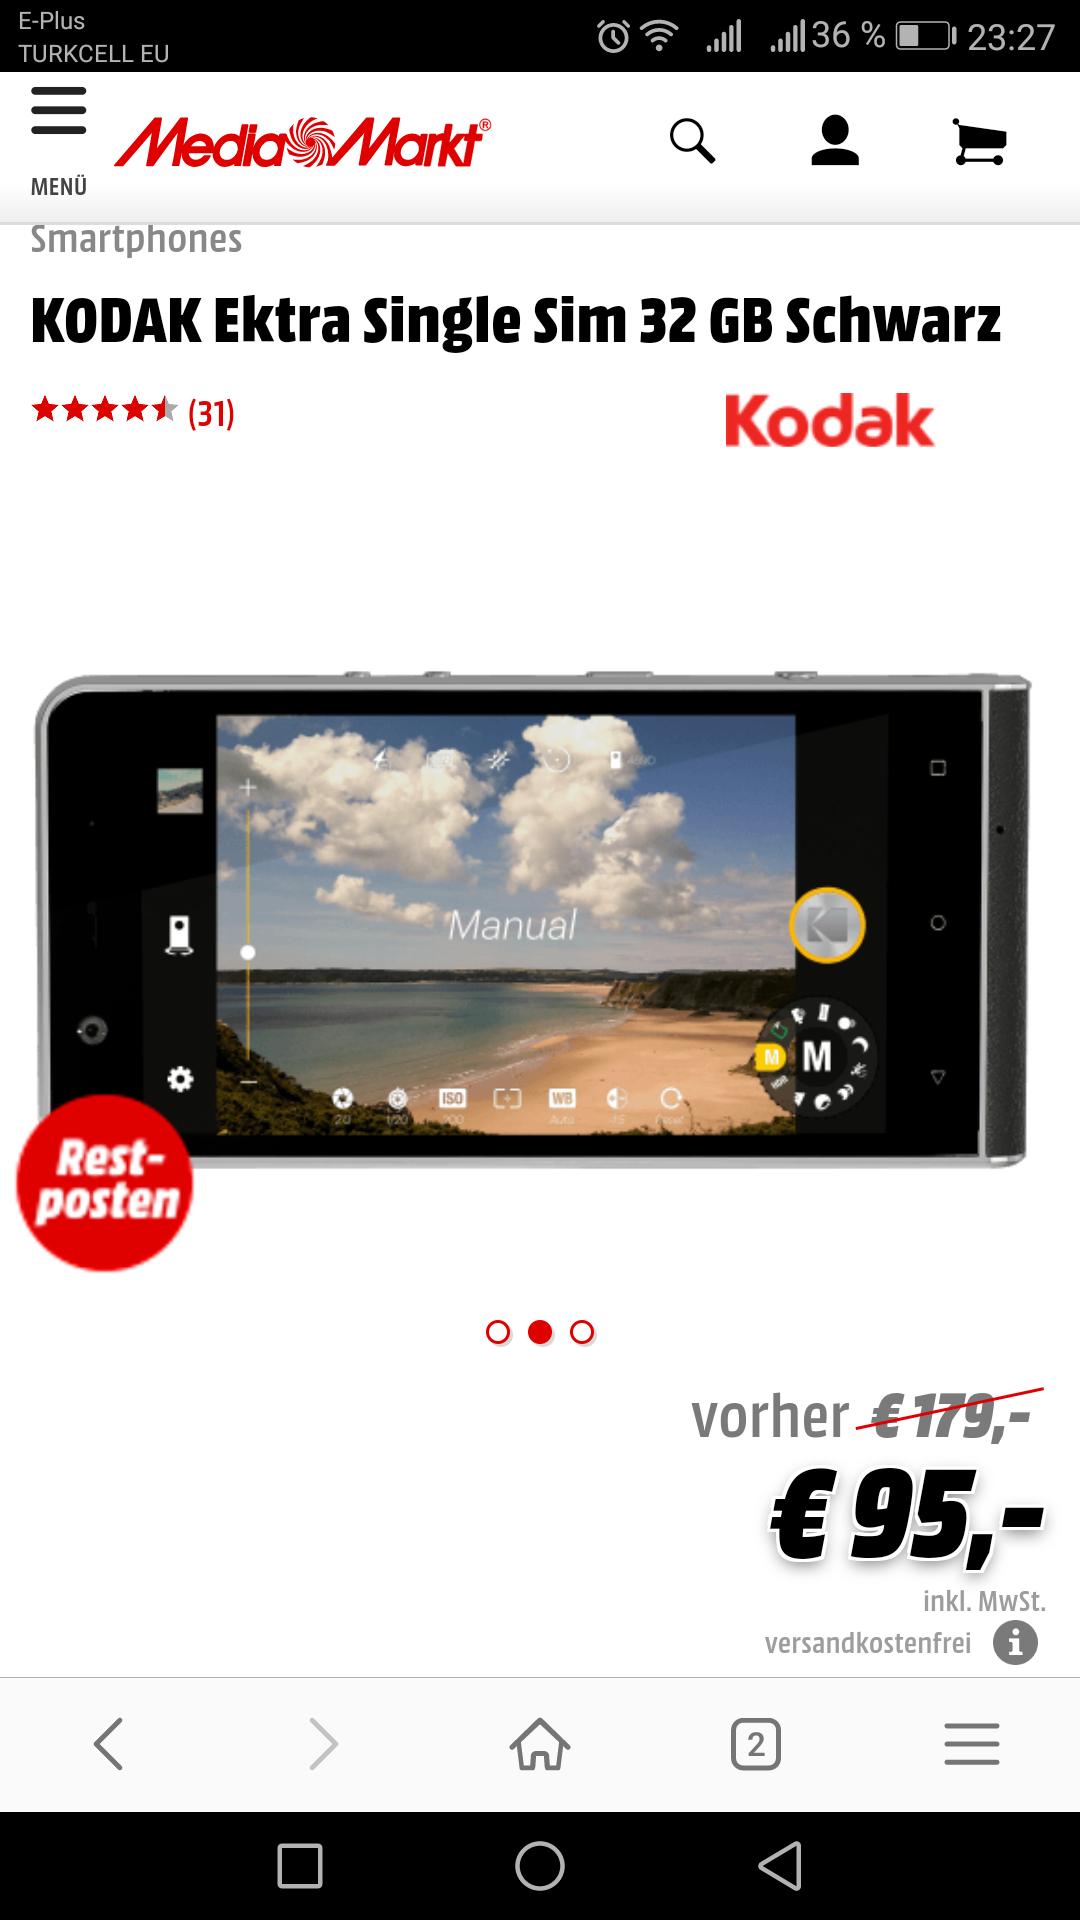 [Media Markt] KODAK Ektra Single Sim 32GB Schwarz / Versandkostenfrei